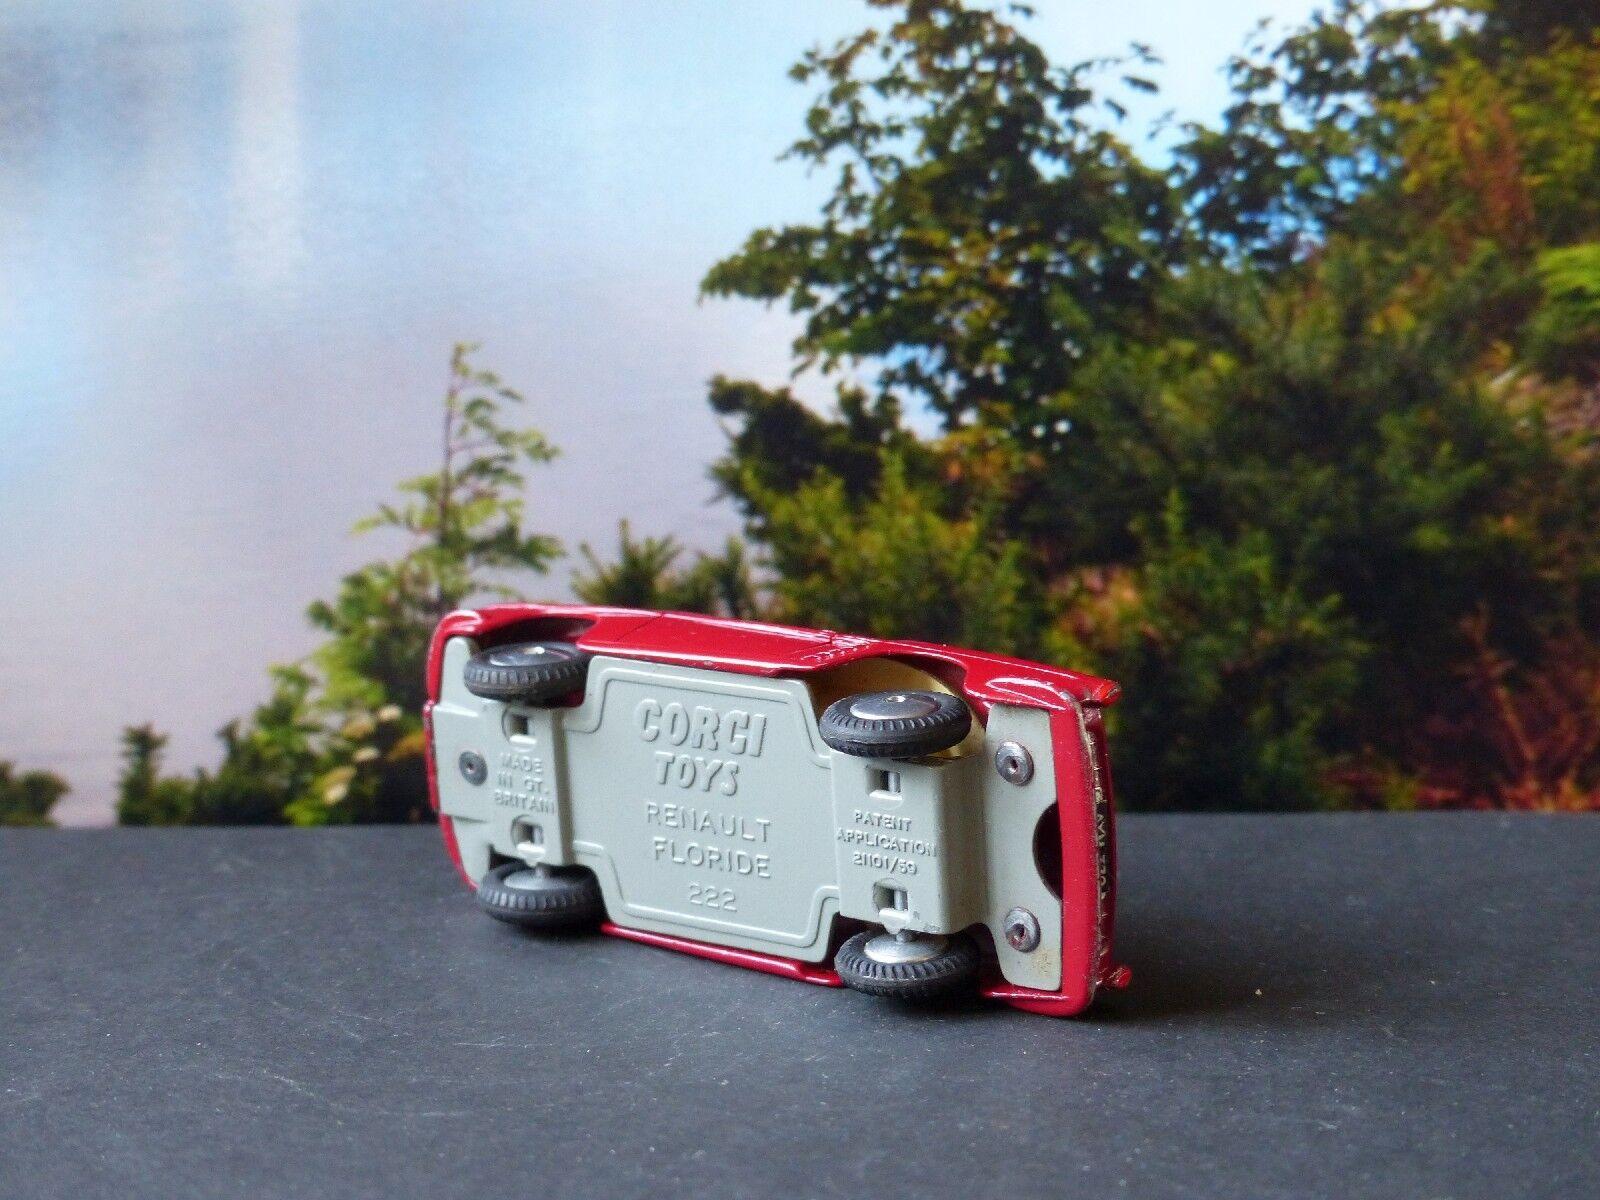 Corgi Toys 222 222 222 Renault Floride rojo-maroon c81845